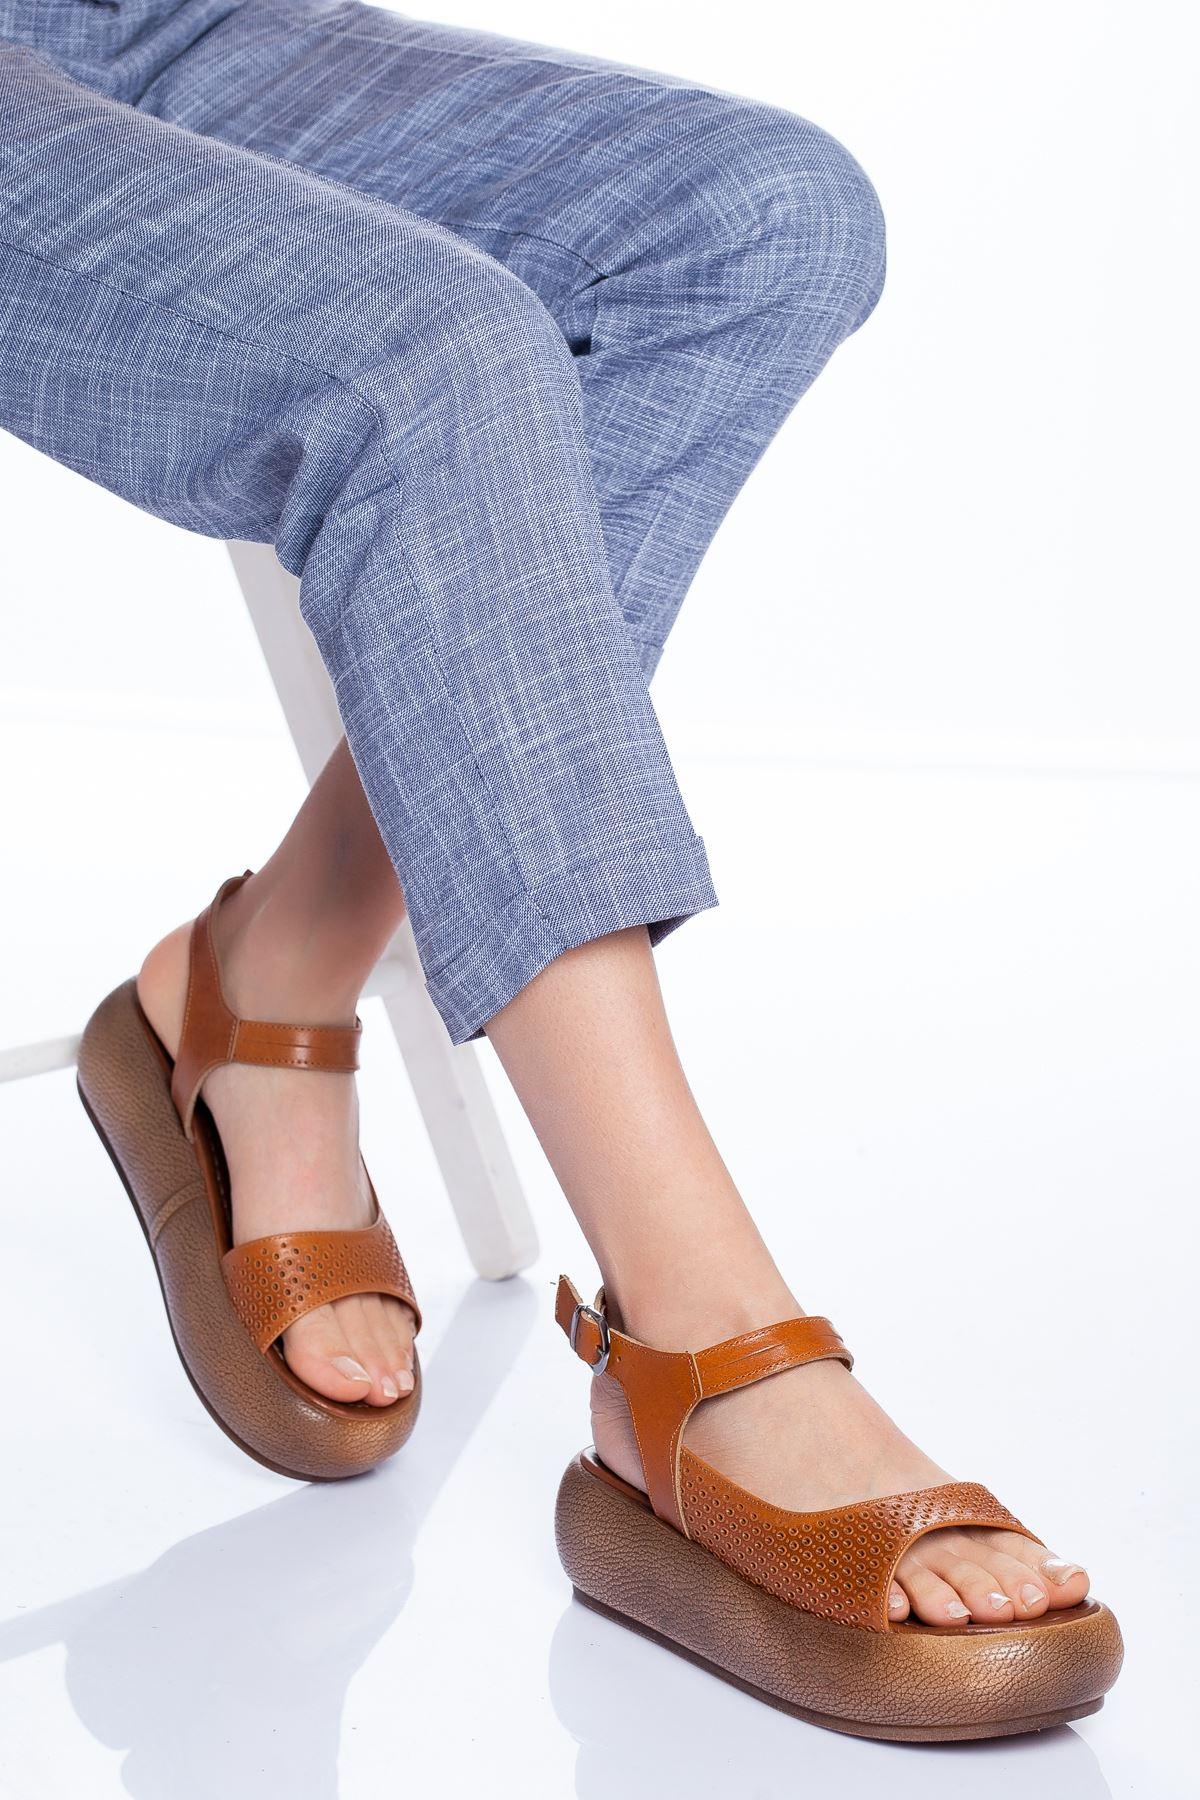 Mia Hakiki Deri Sandalet TABA